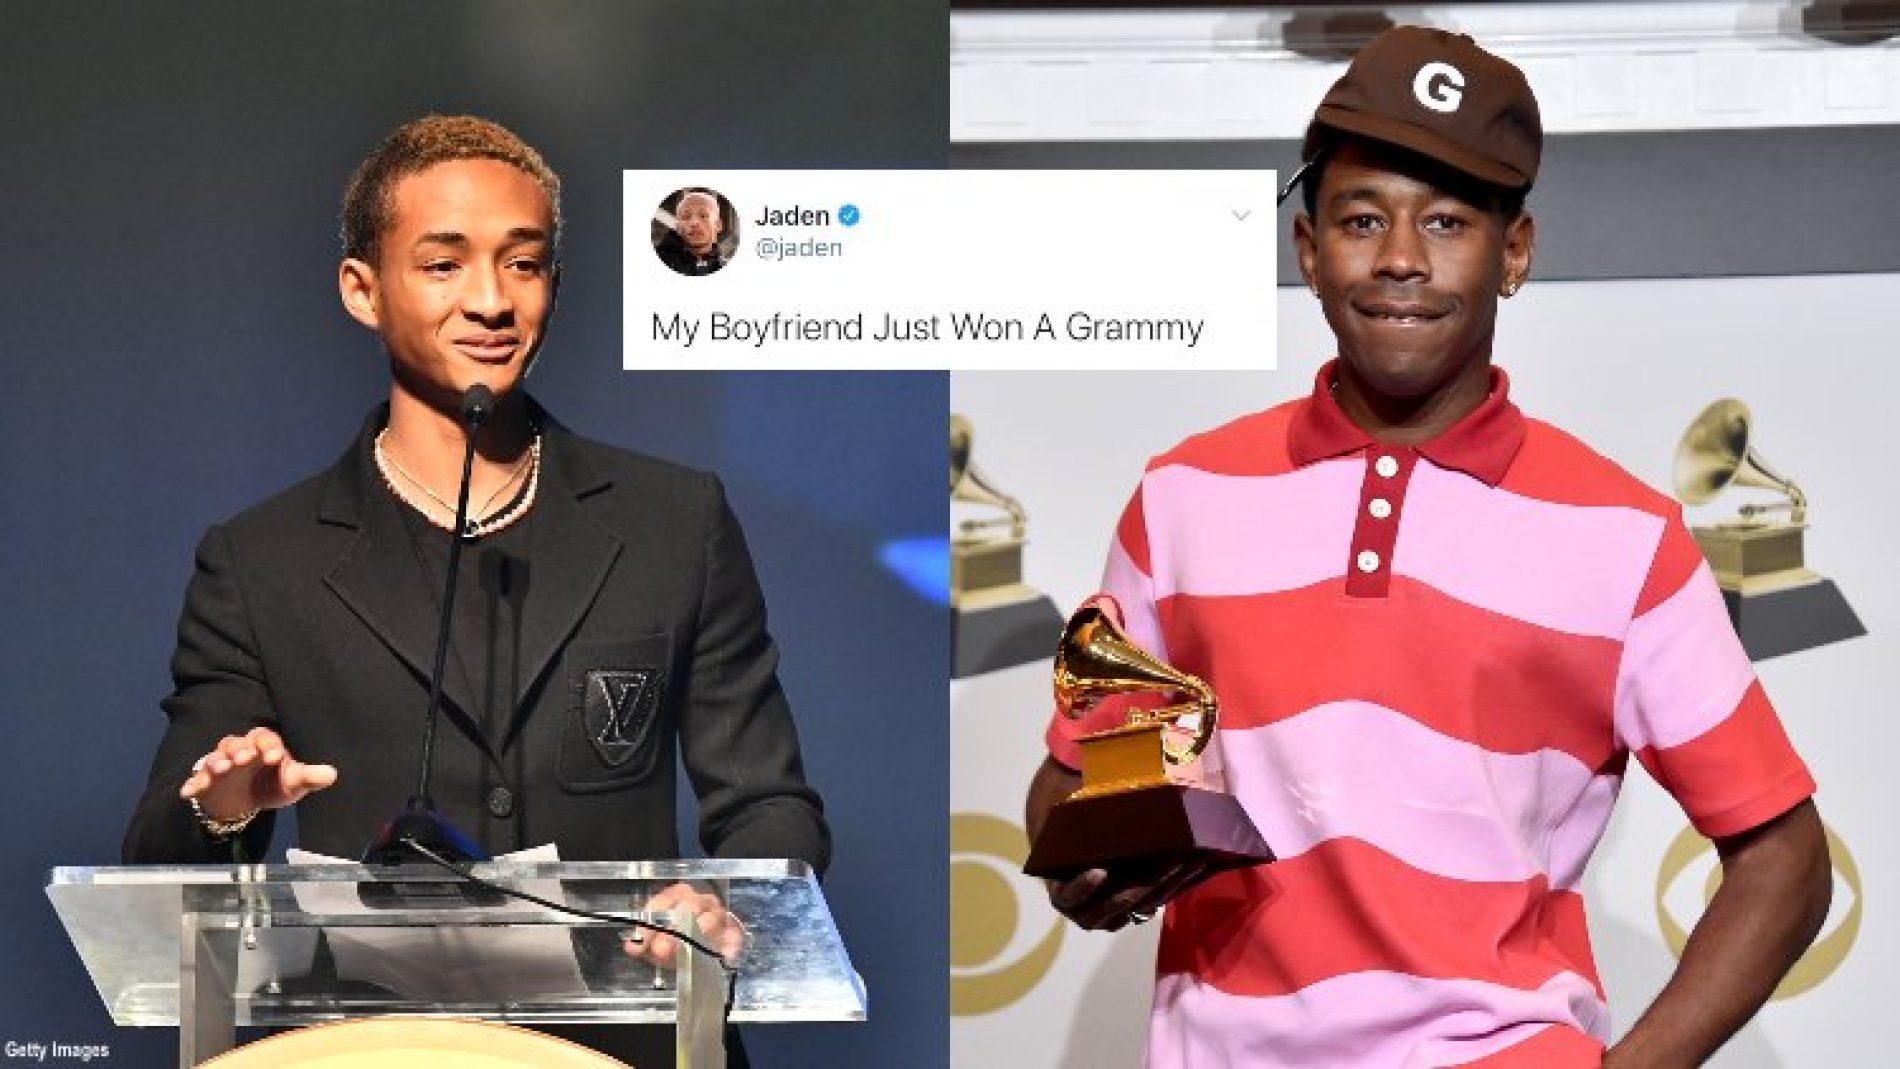 Jaden Smith Congratulates 'Boyfriend' Tyler, The Creator On His Grammy Win